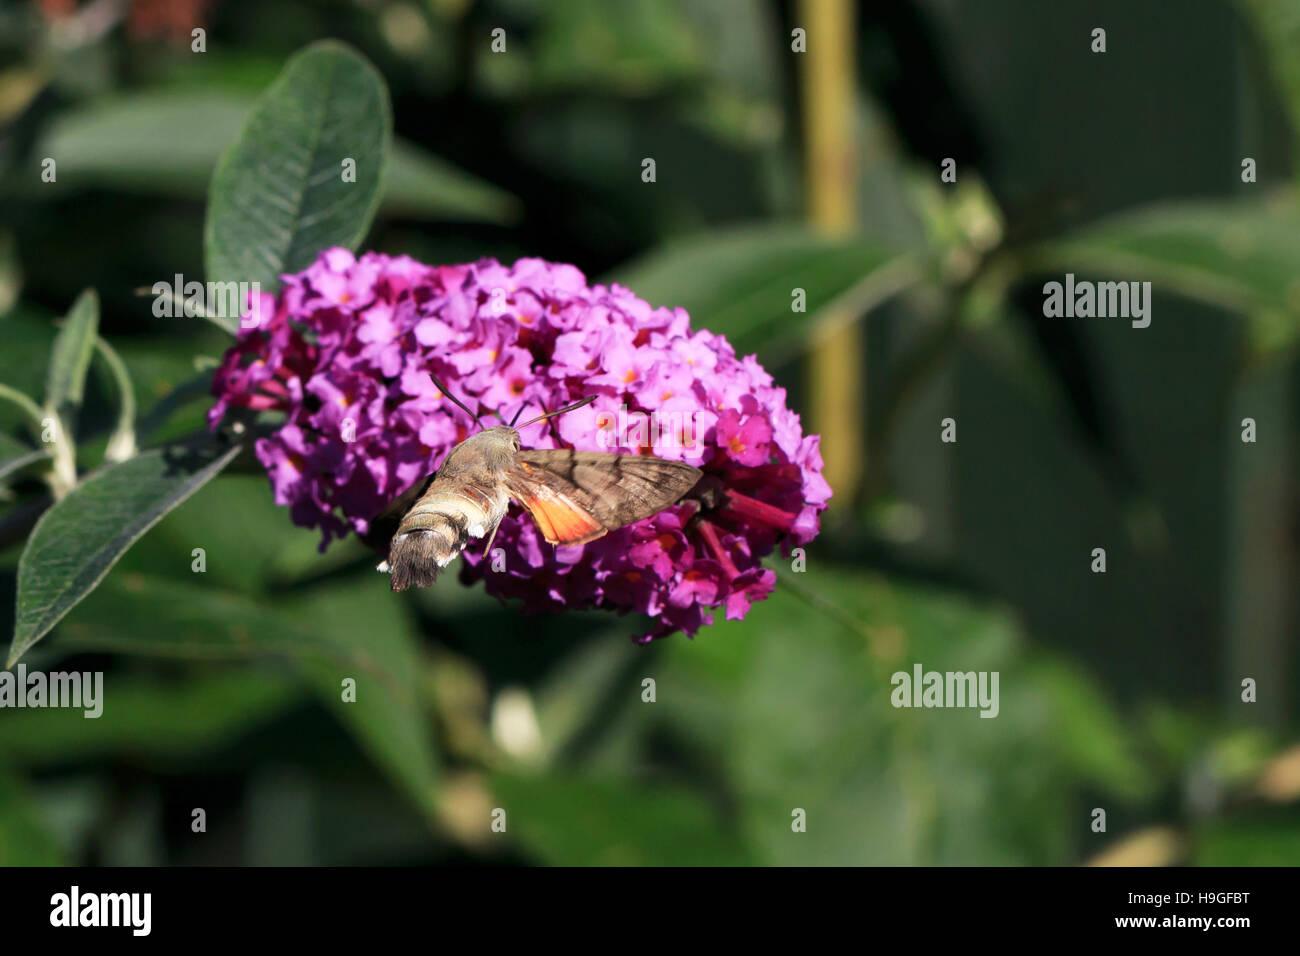 Humming-bird Hawk-moth feeding from Buddleia flowers in the UK - Stock Image